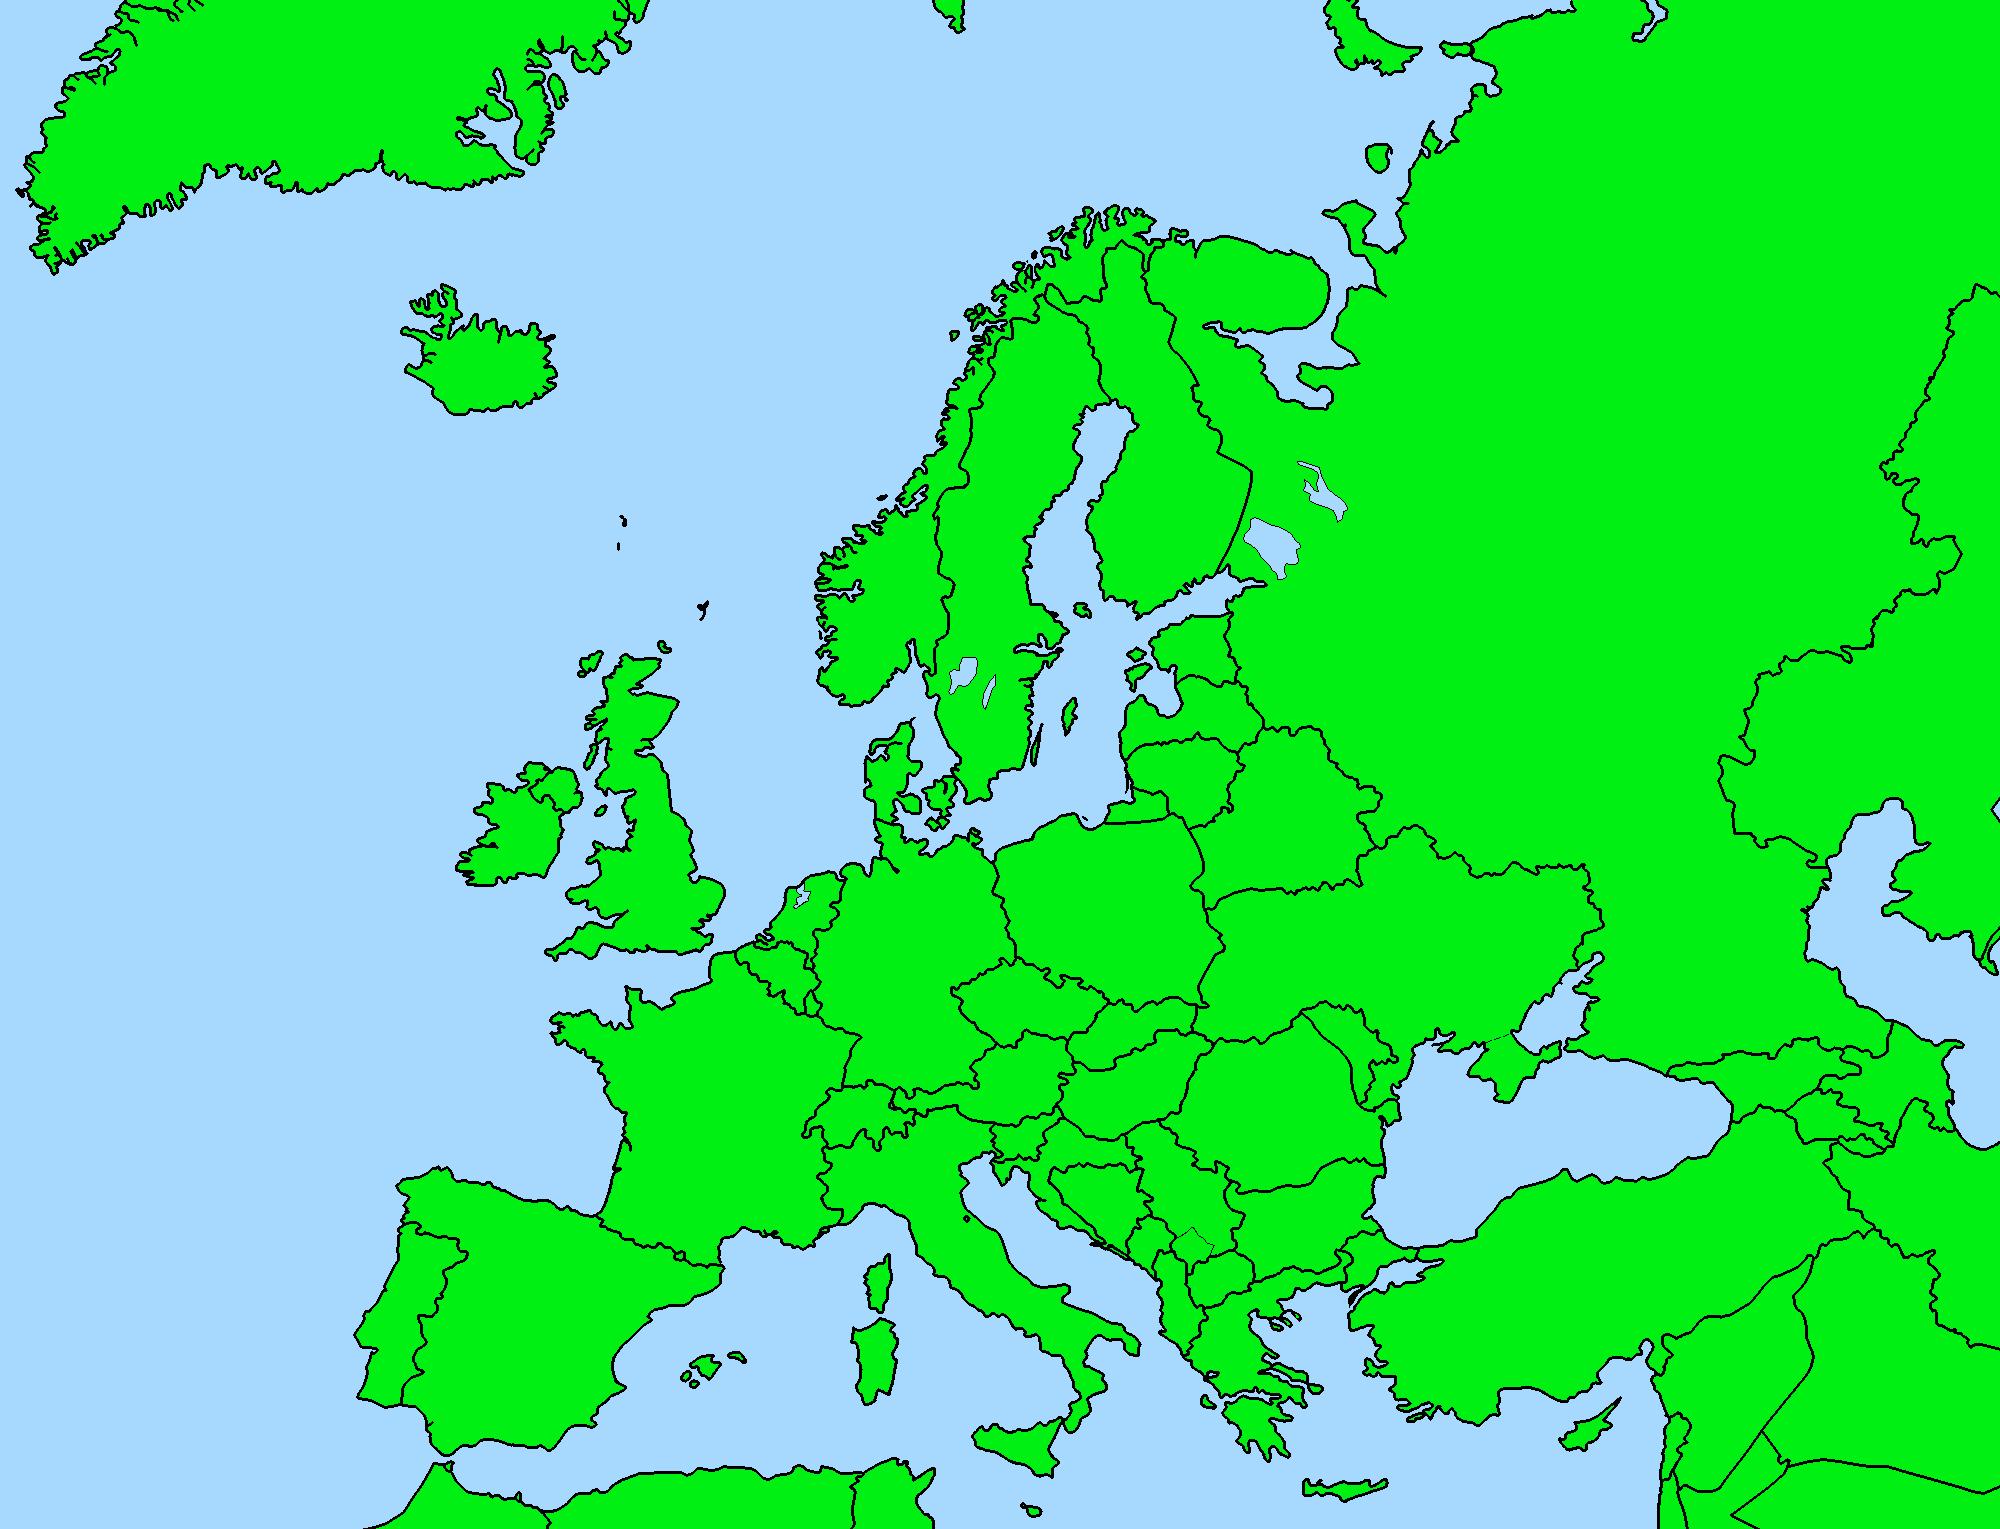 Файл:FinnMapperEuropeanMap.png